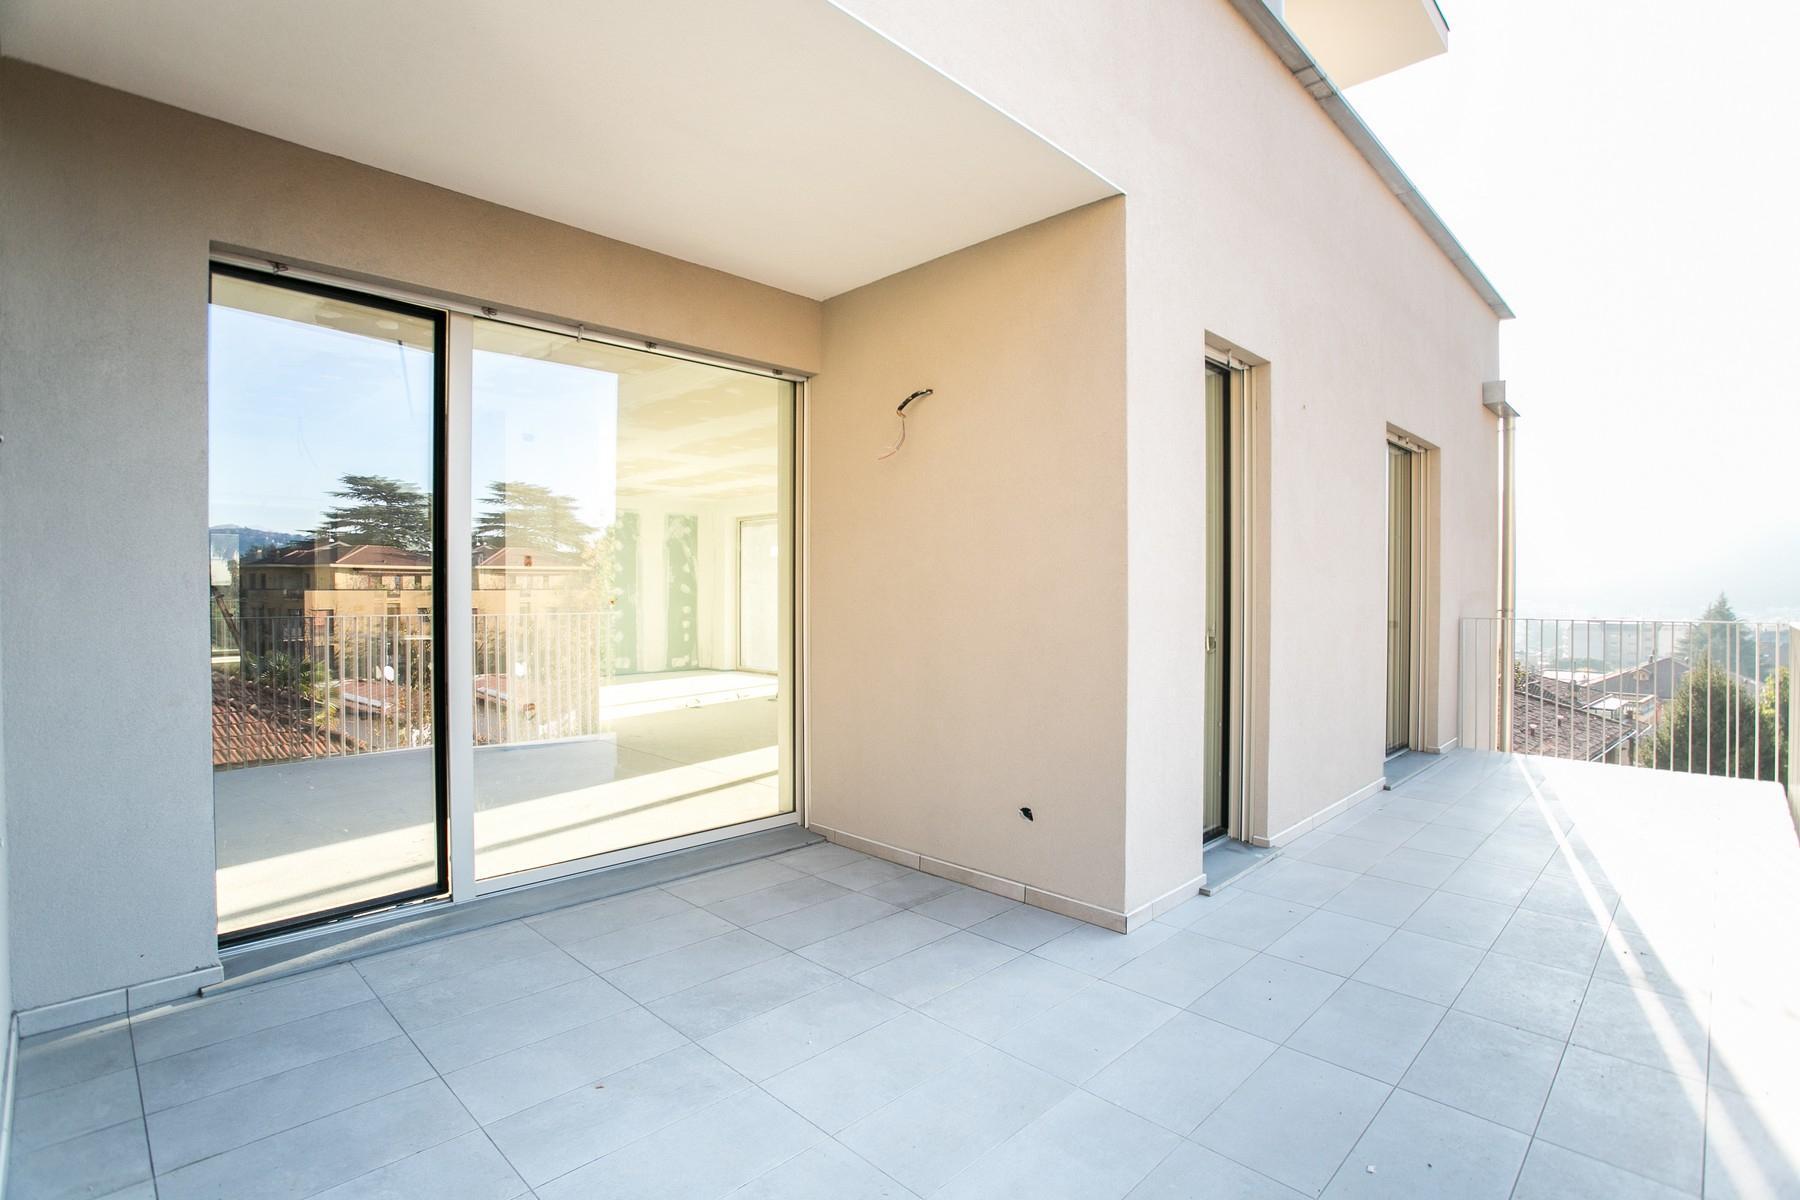 Exclusif appartement neuf en position panoramique - 13